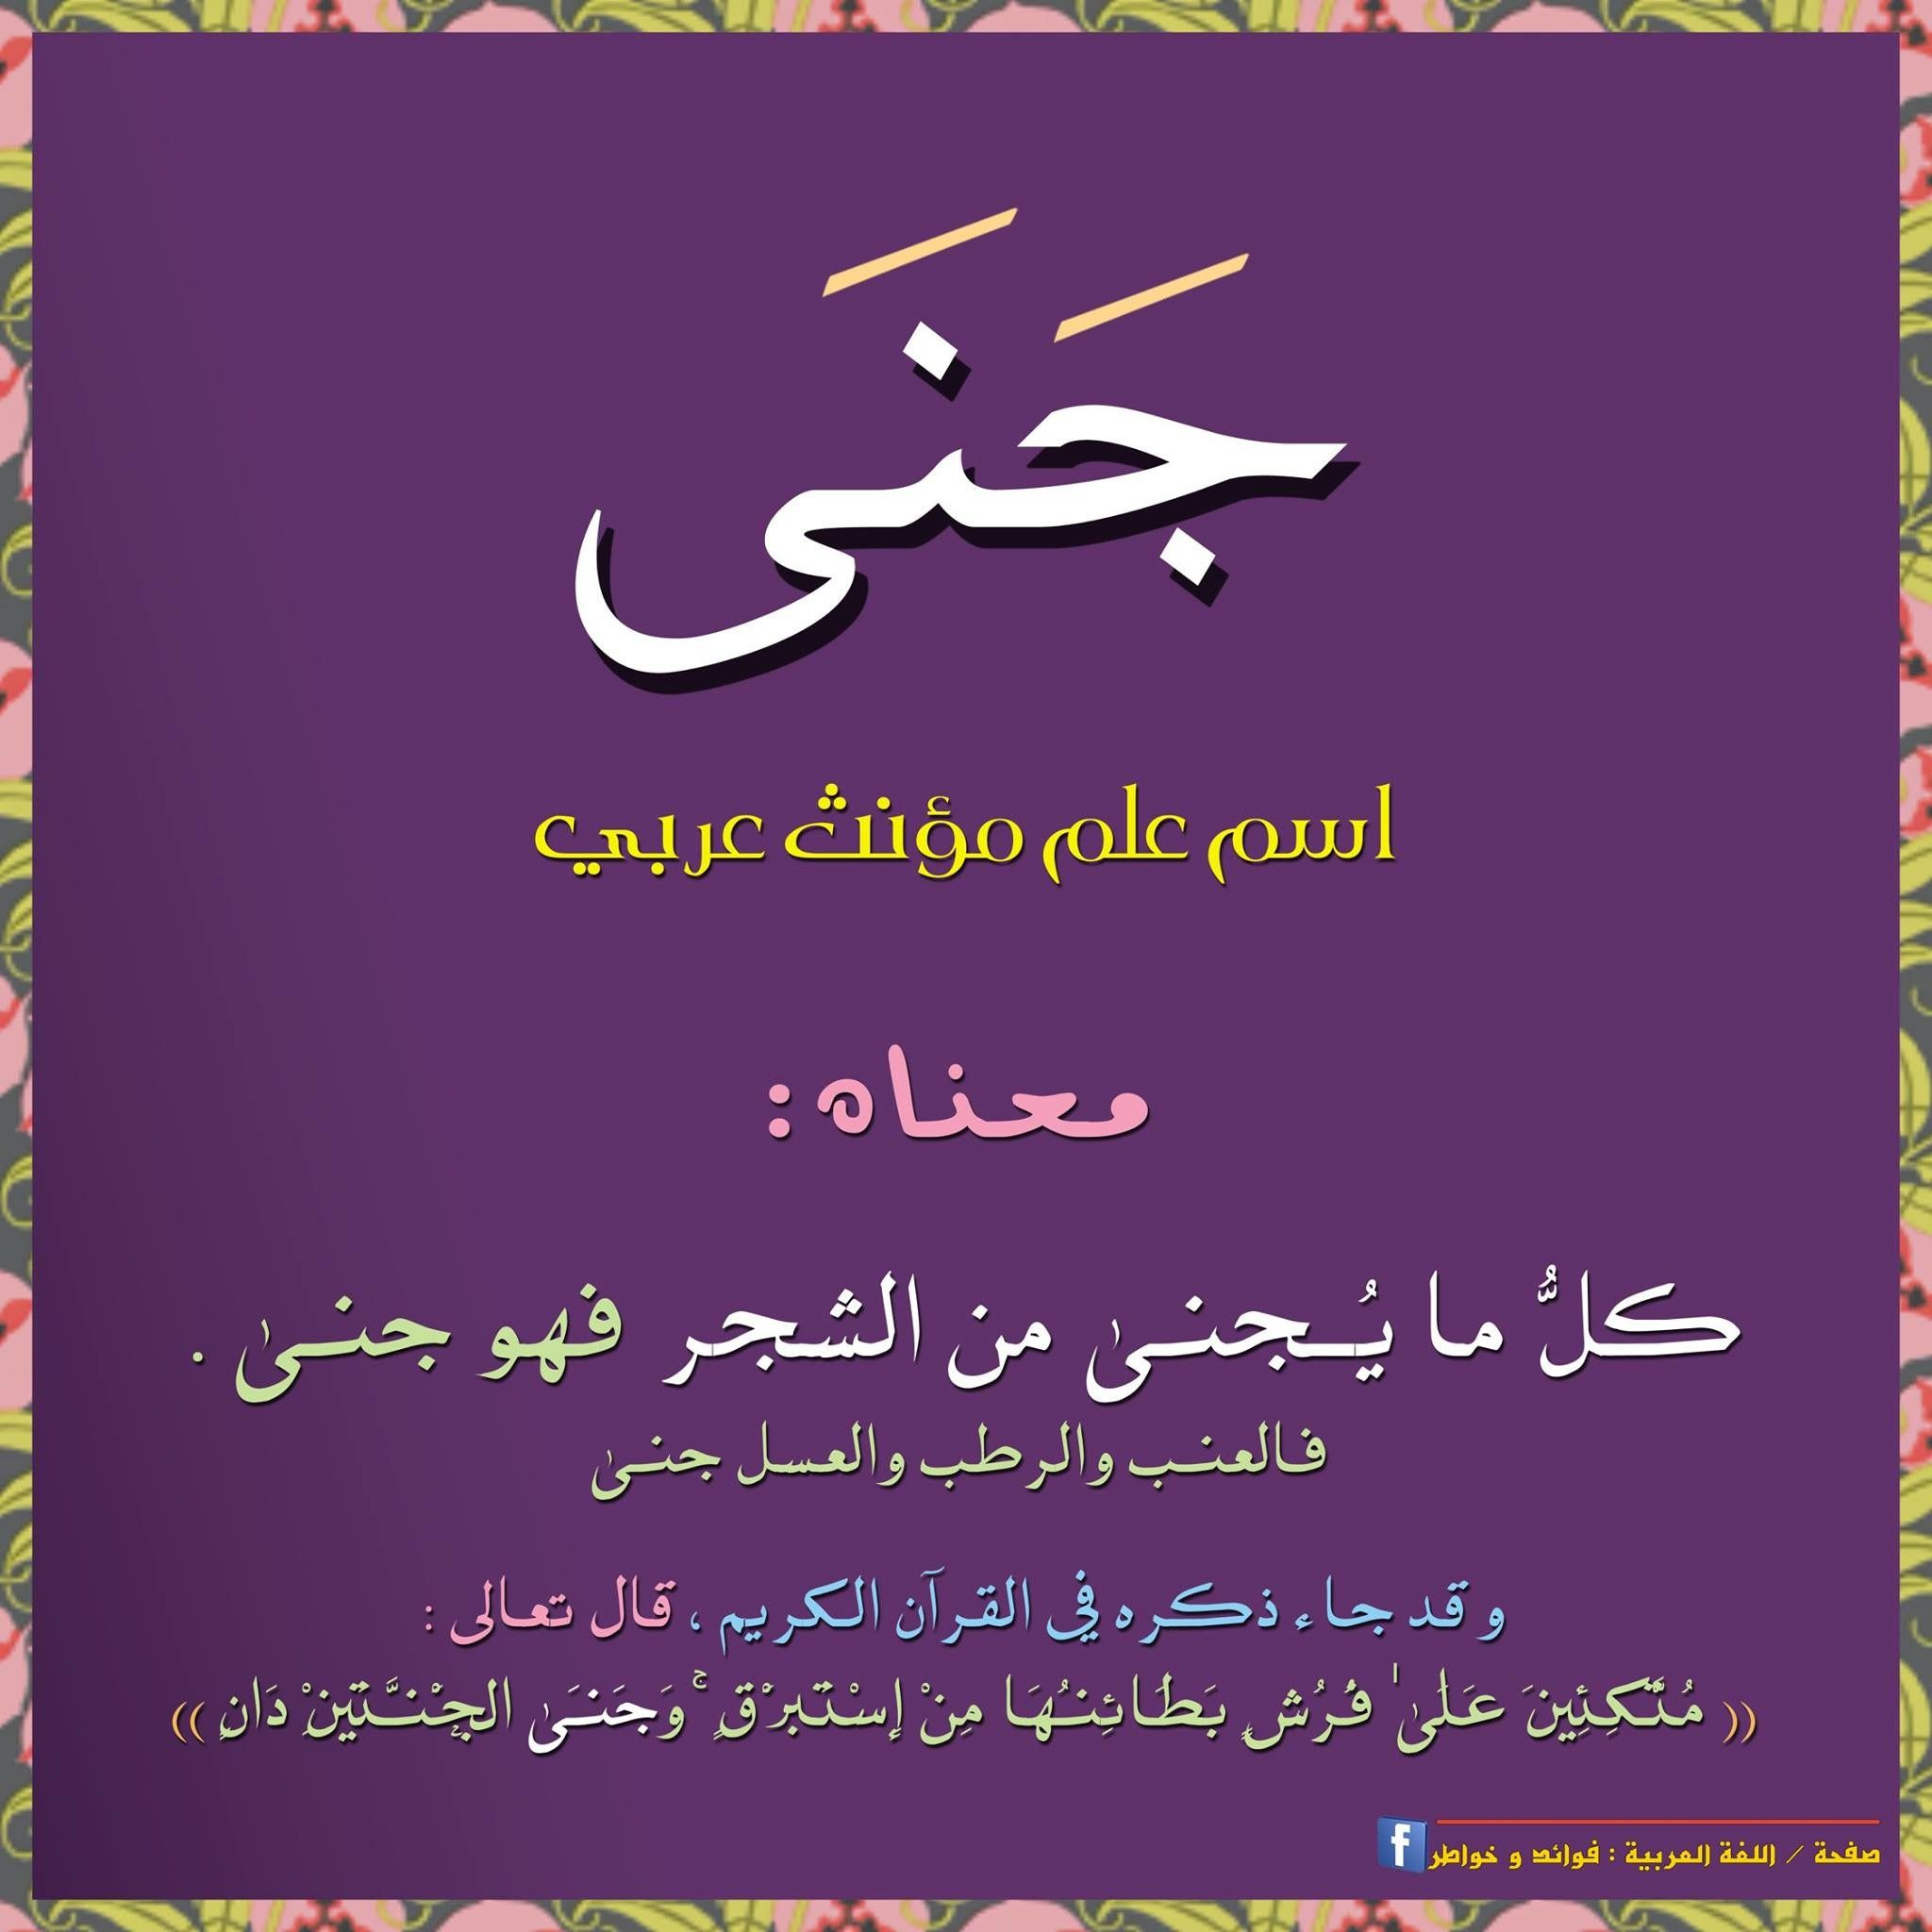 Pin By Khaled Bahnasawy On ٥٥ سورة الرحمن Learn Arabic Language Words Arabic Baby Girl Names